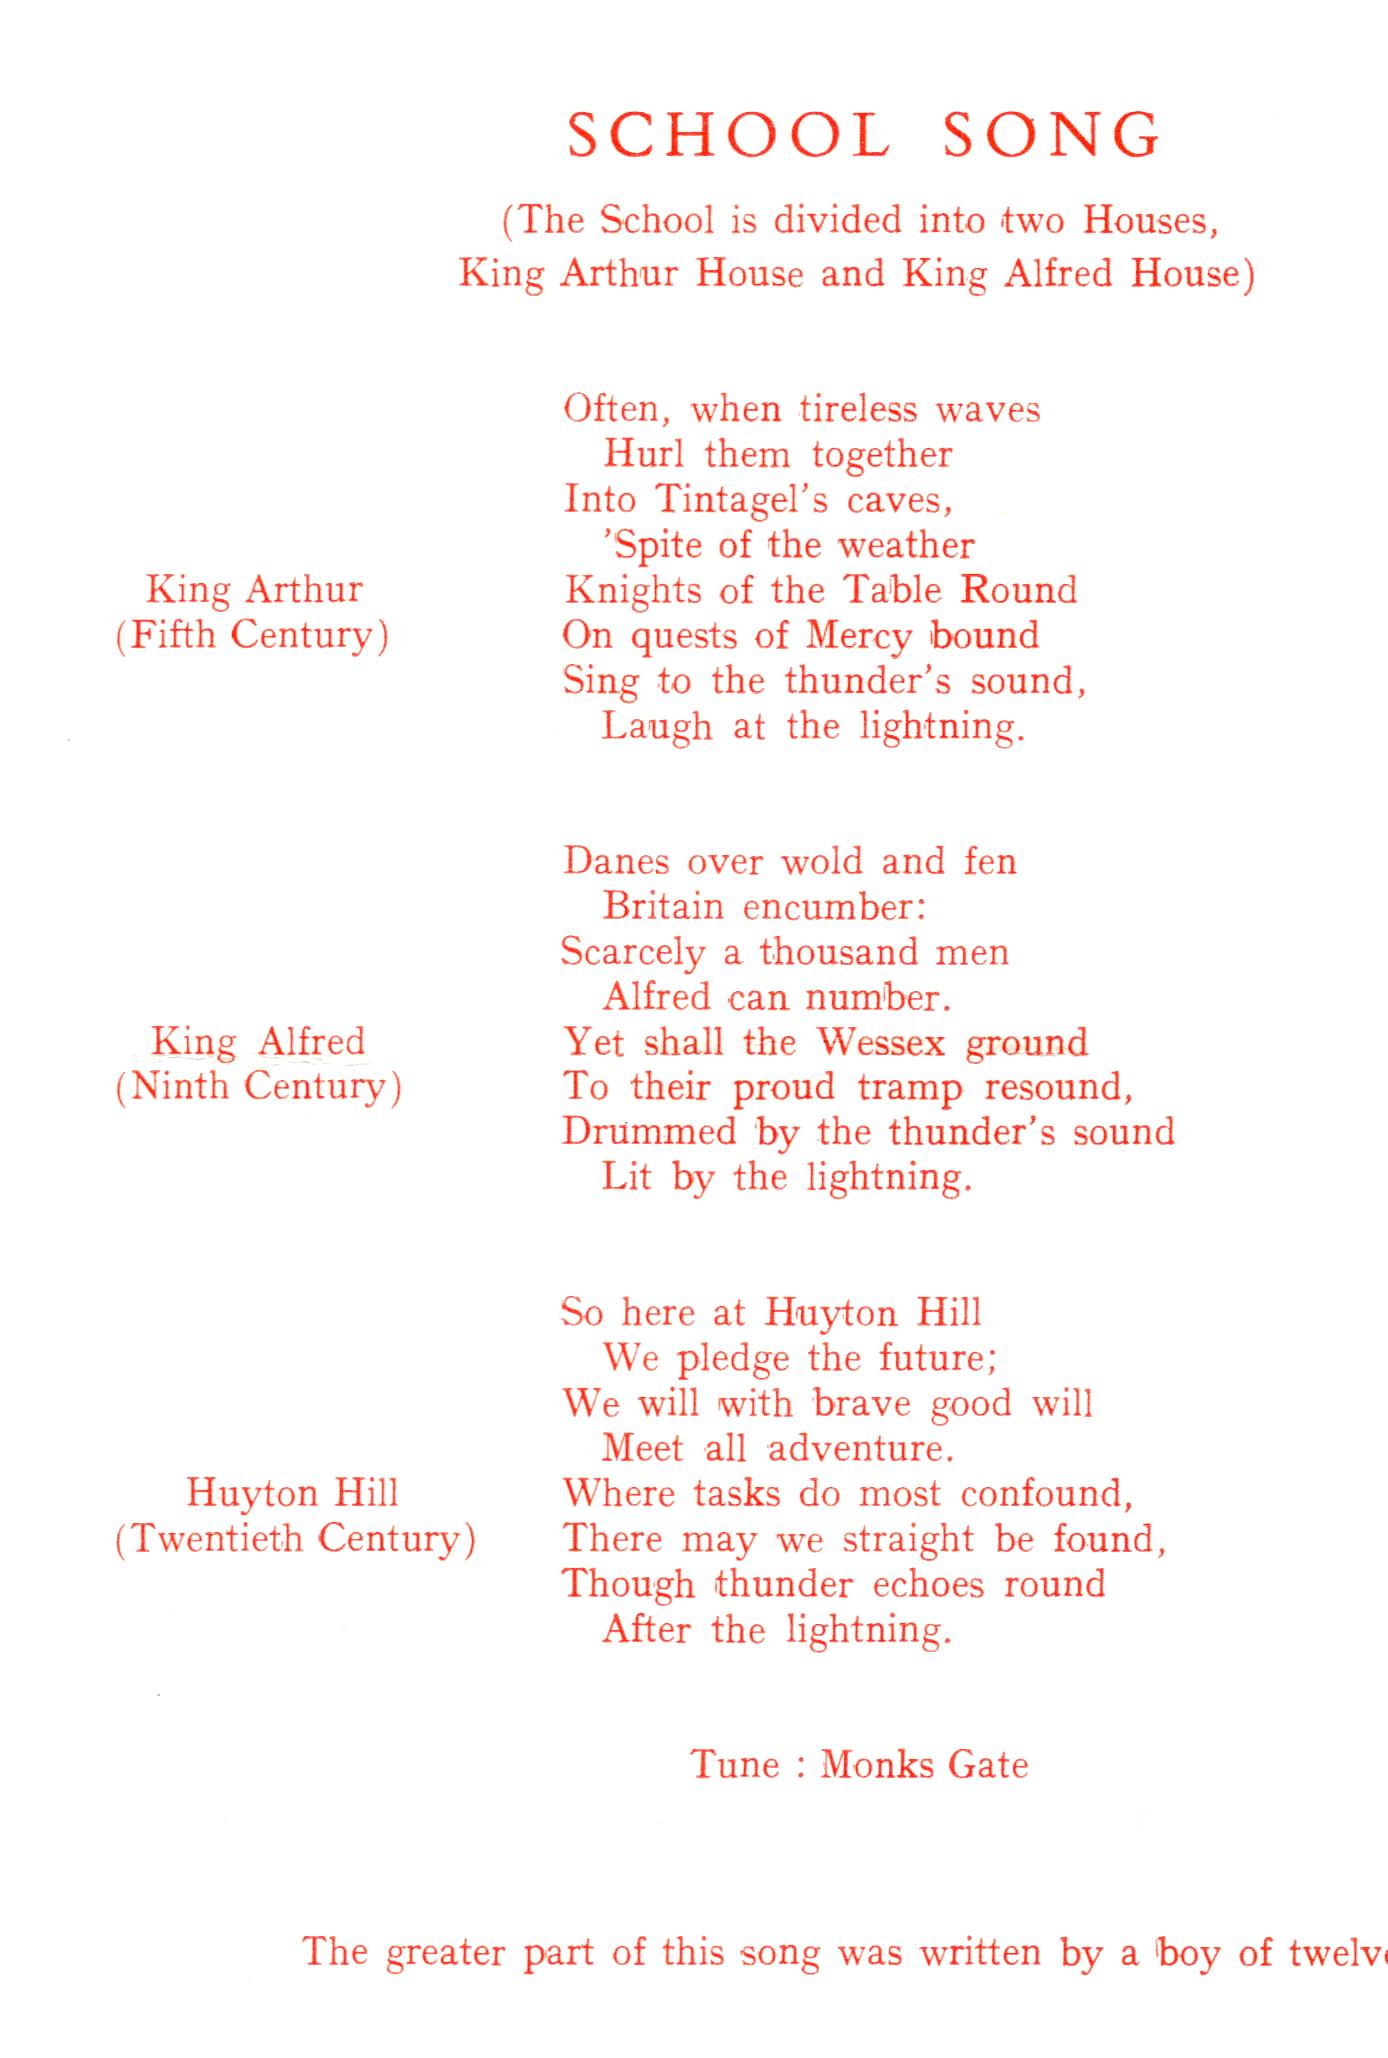 File:Huyton Hill School Song.jpg - Wikipedia